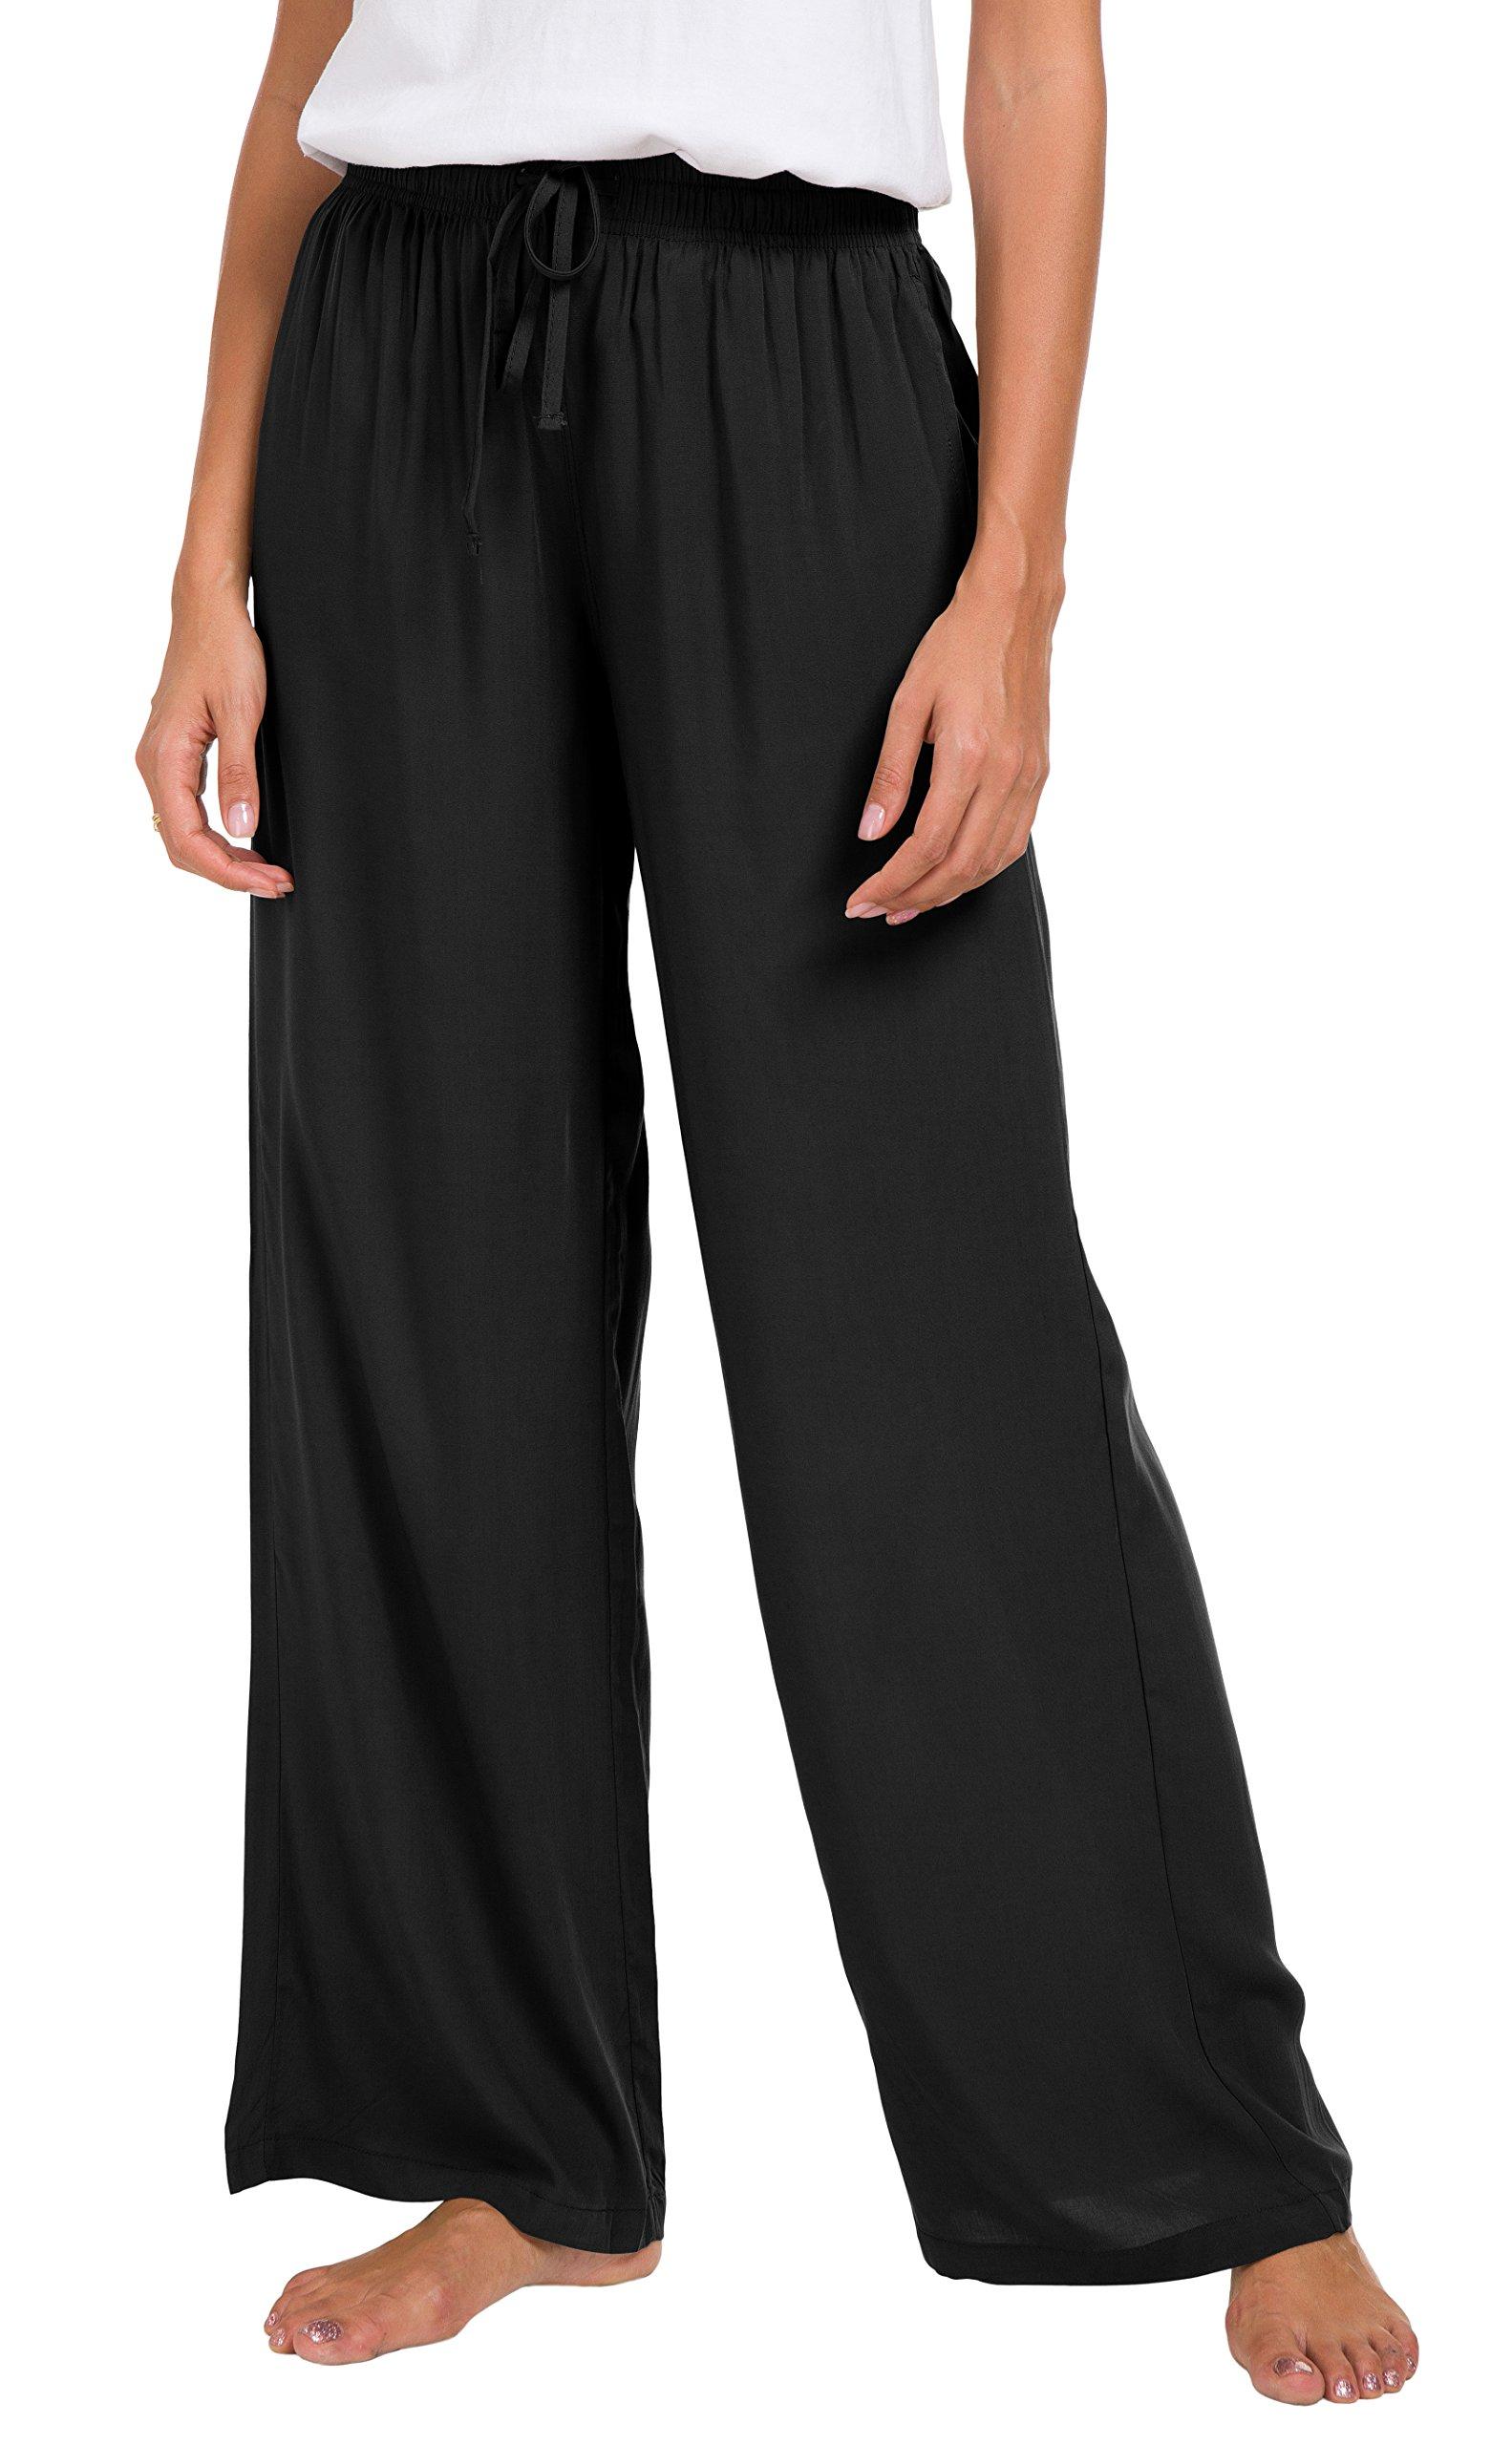 Urban CoCo Women's Solid Color Drawstring Lounge Pants (XL, Black)